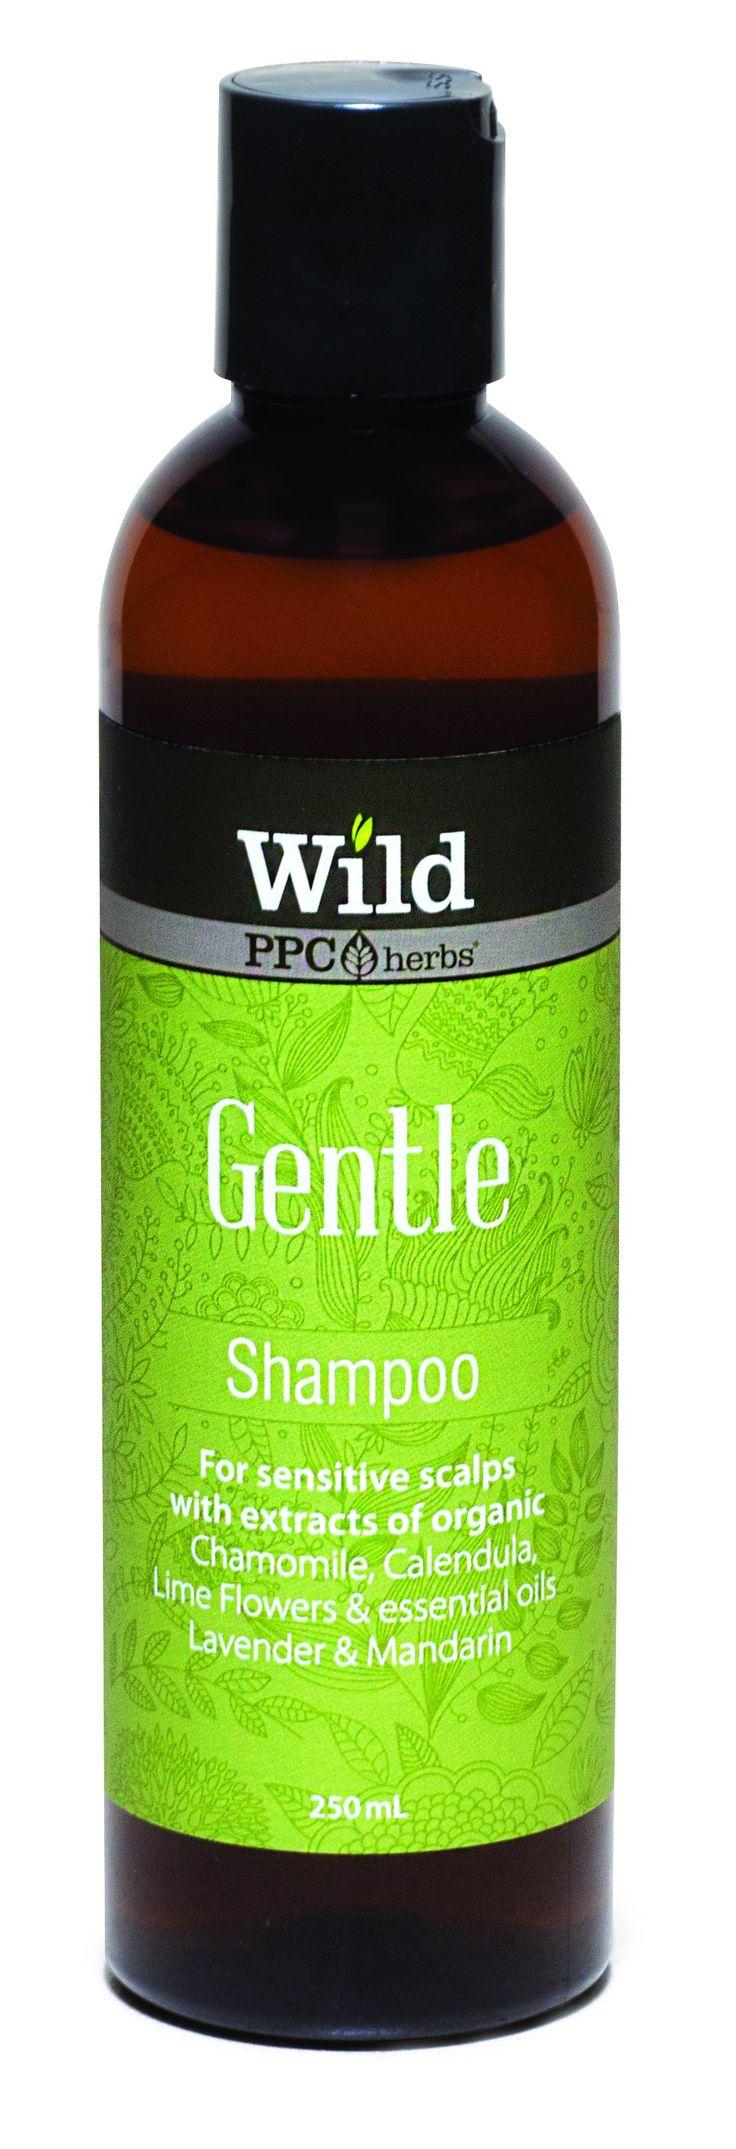 Wild PPC | Gentle Hair Shampoo for Sensitive Scalps- 250ml